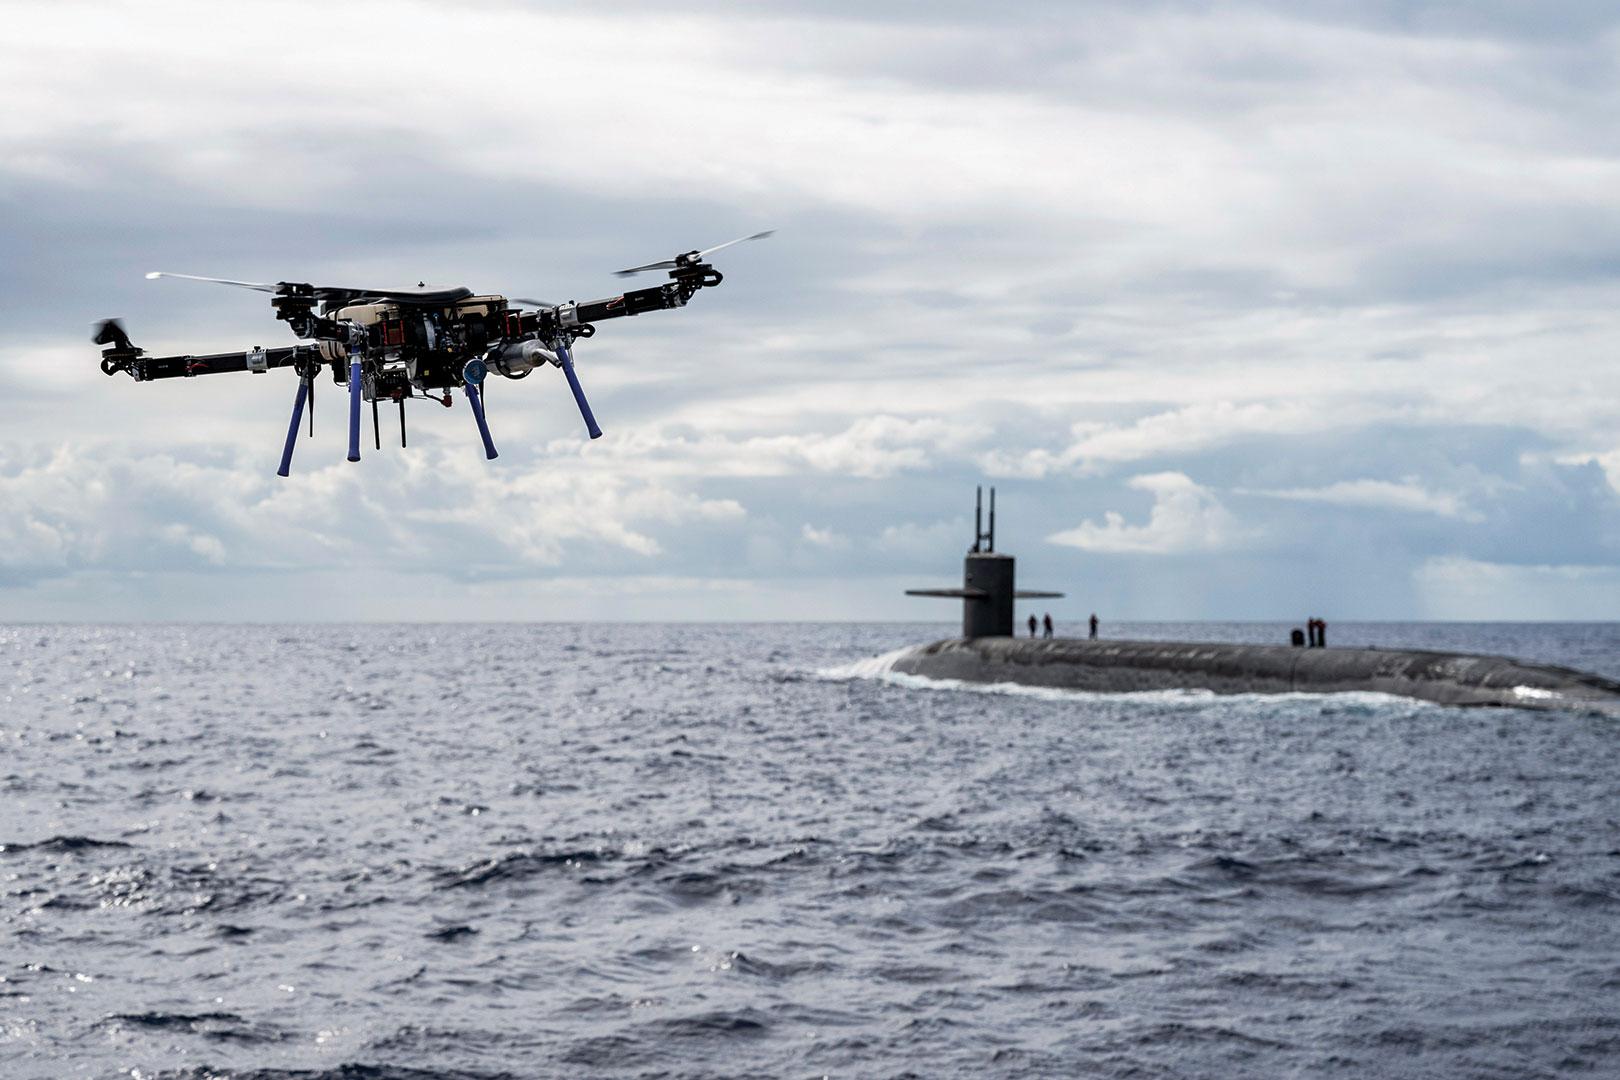 EIZO_Rugged_Naval_Drone